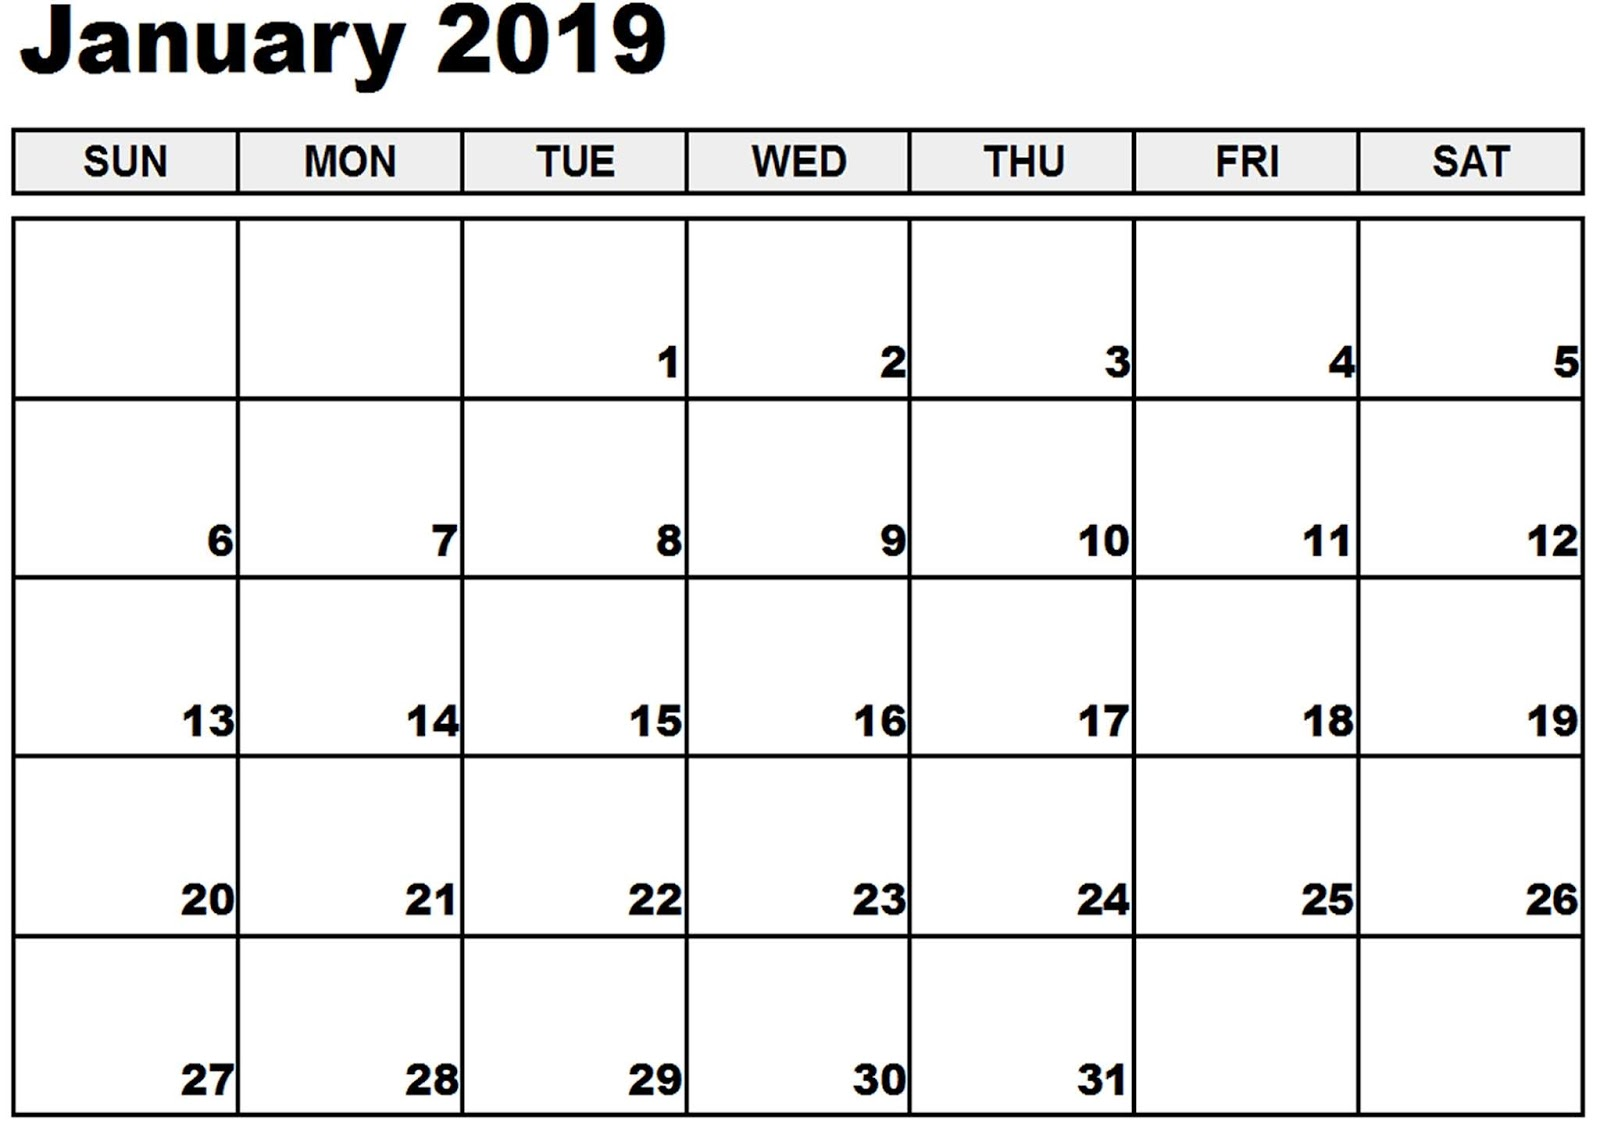 January 2019 Free Calendar With Holidays